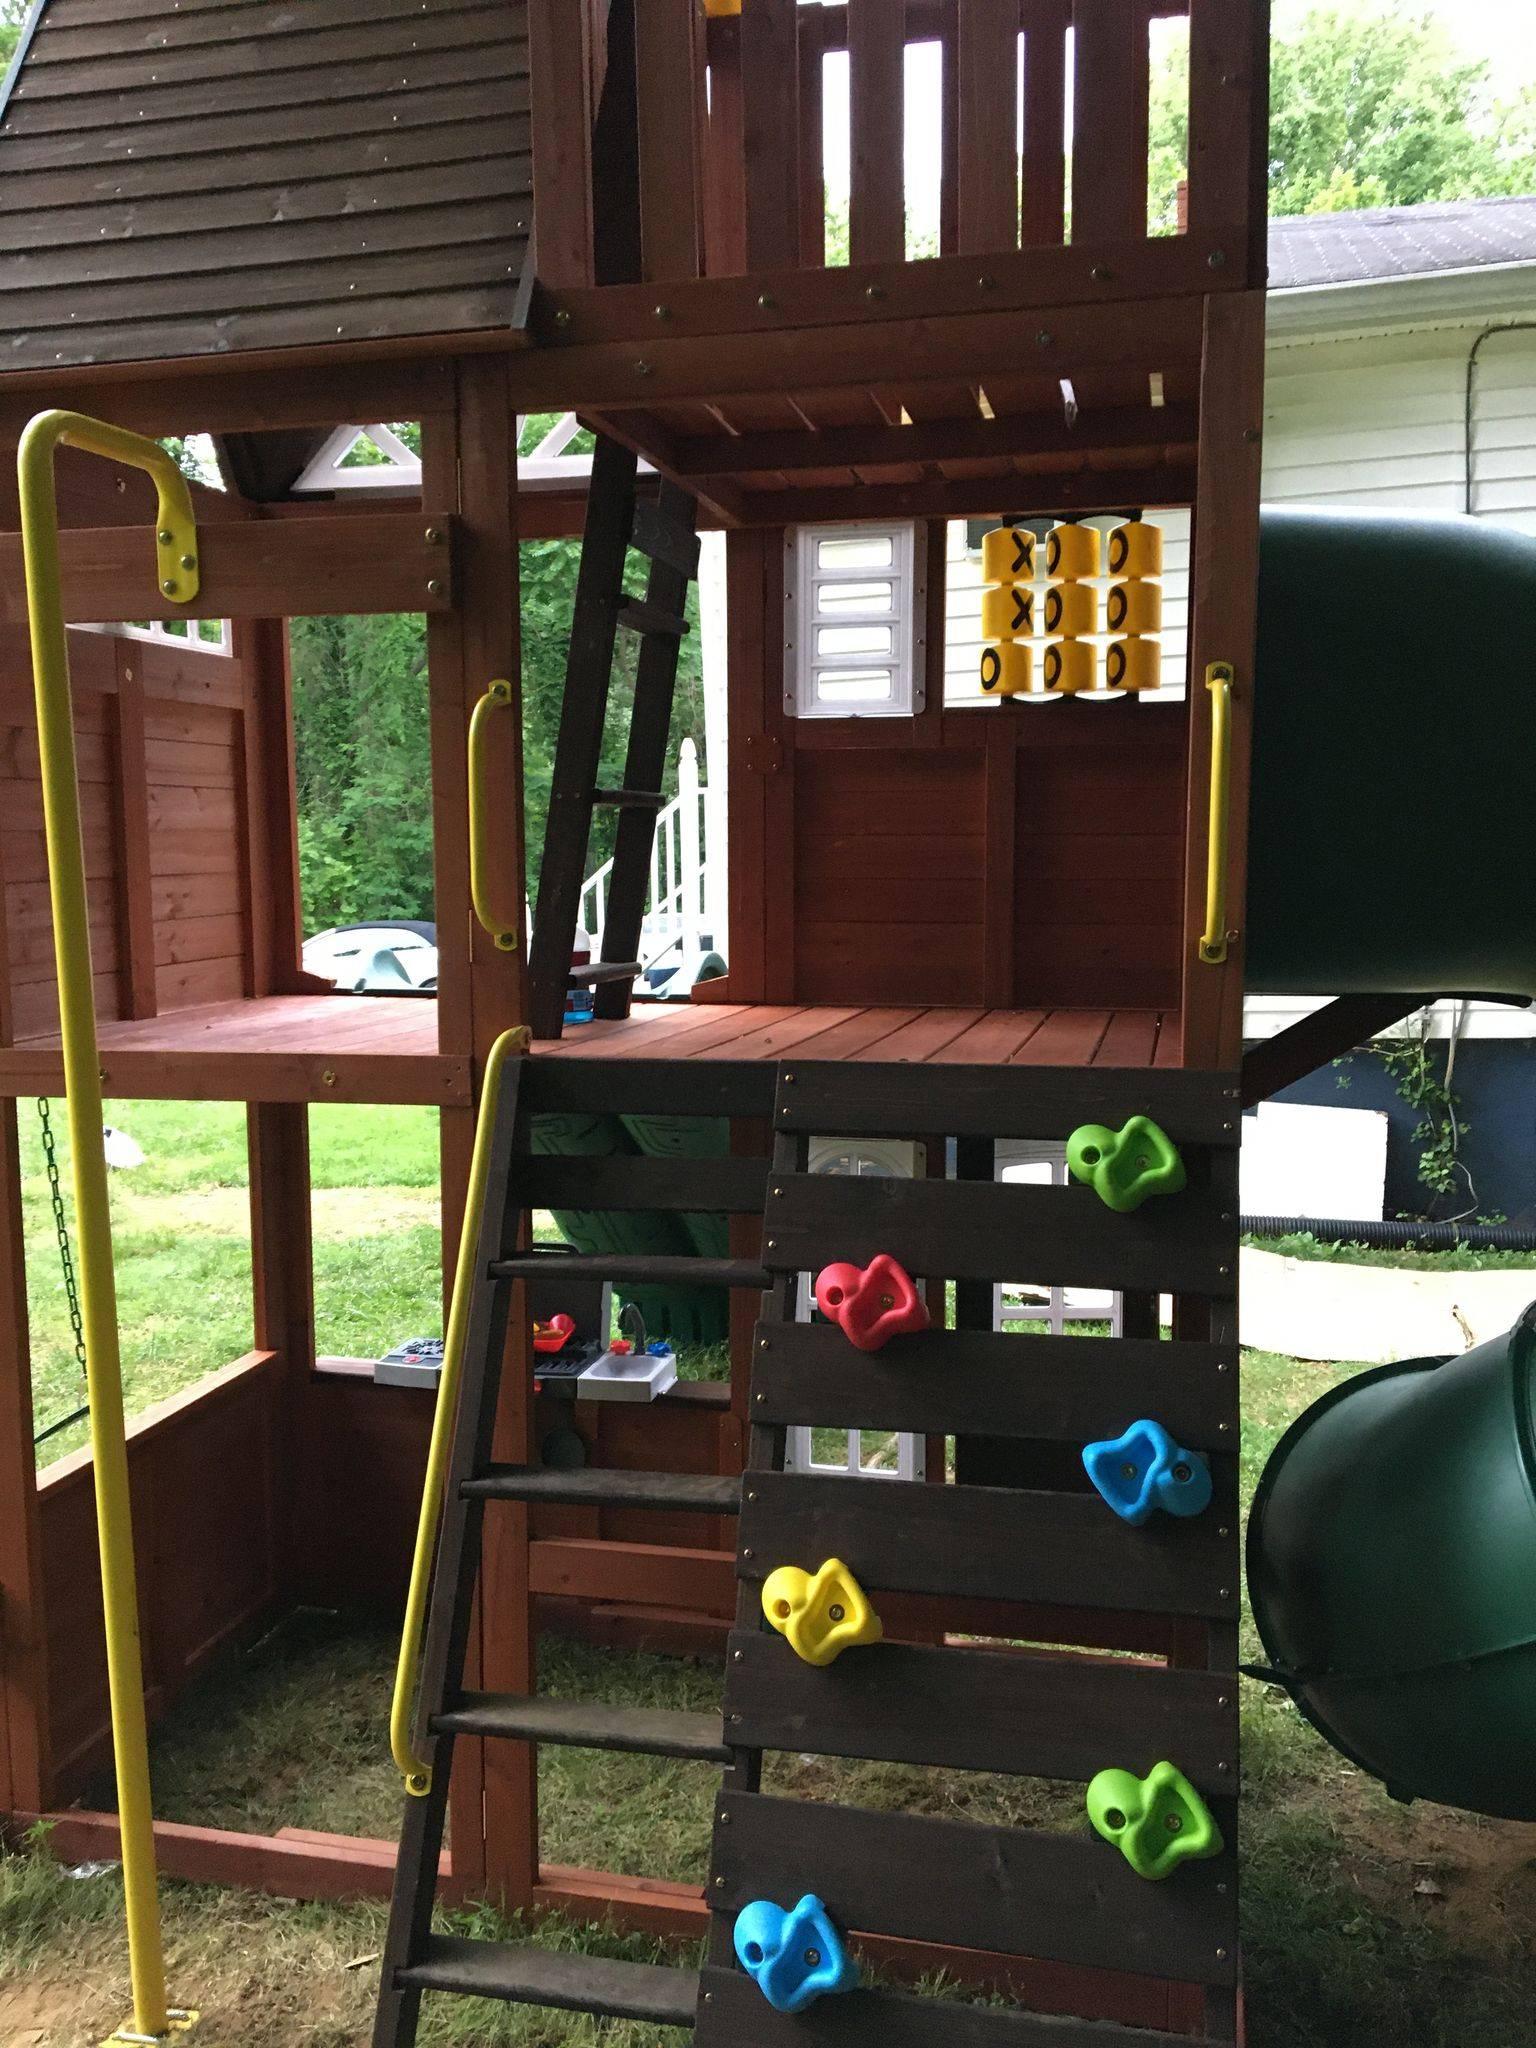 hilltop swing set assembly service in fairfax Virginia